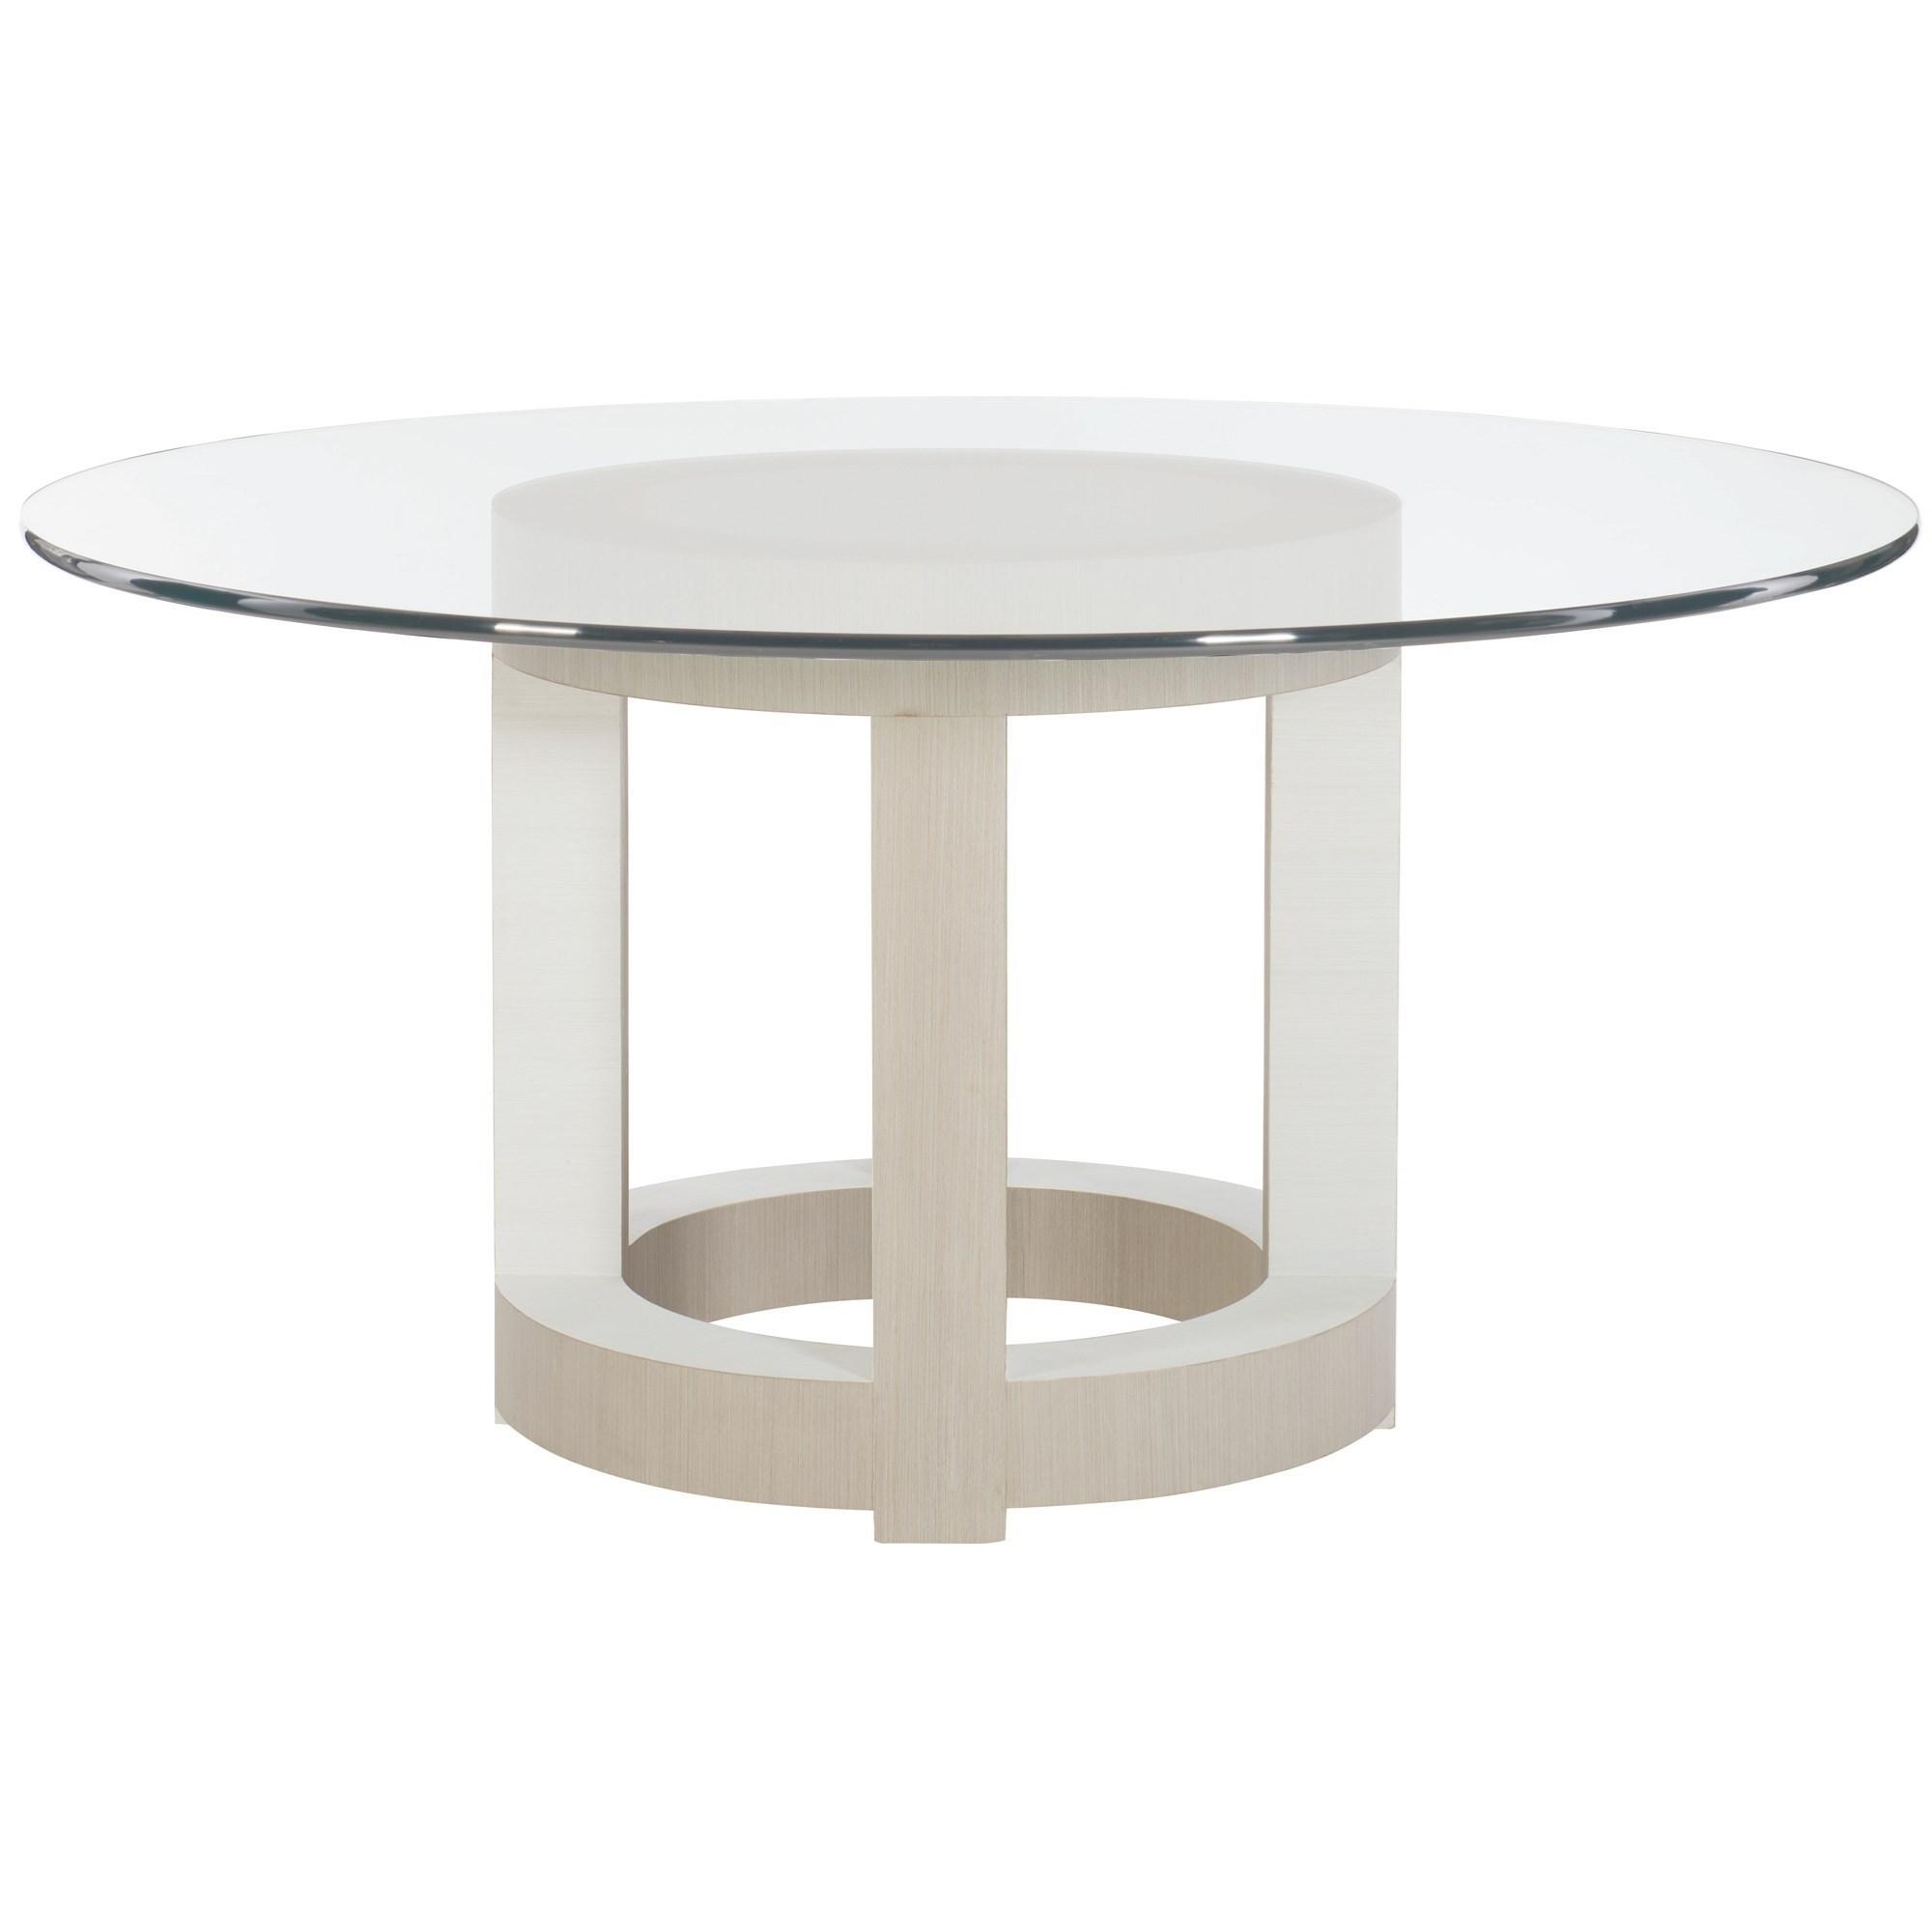 Axiom Round Dining Table at Williams & Kay